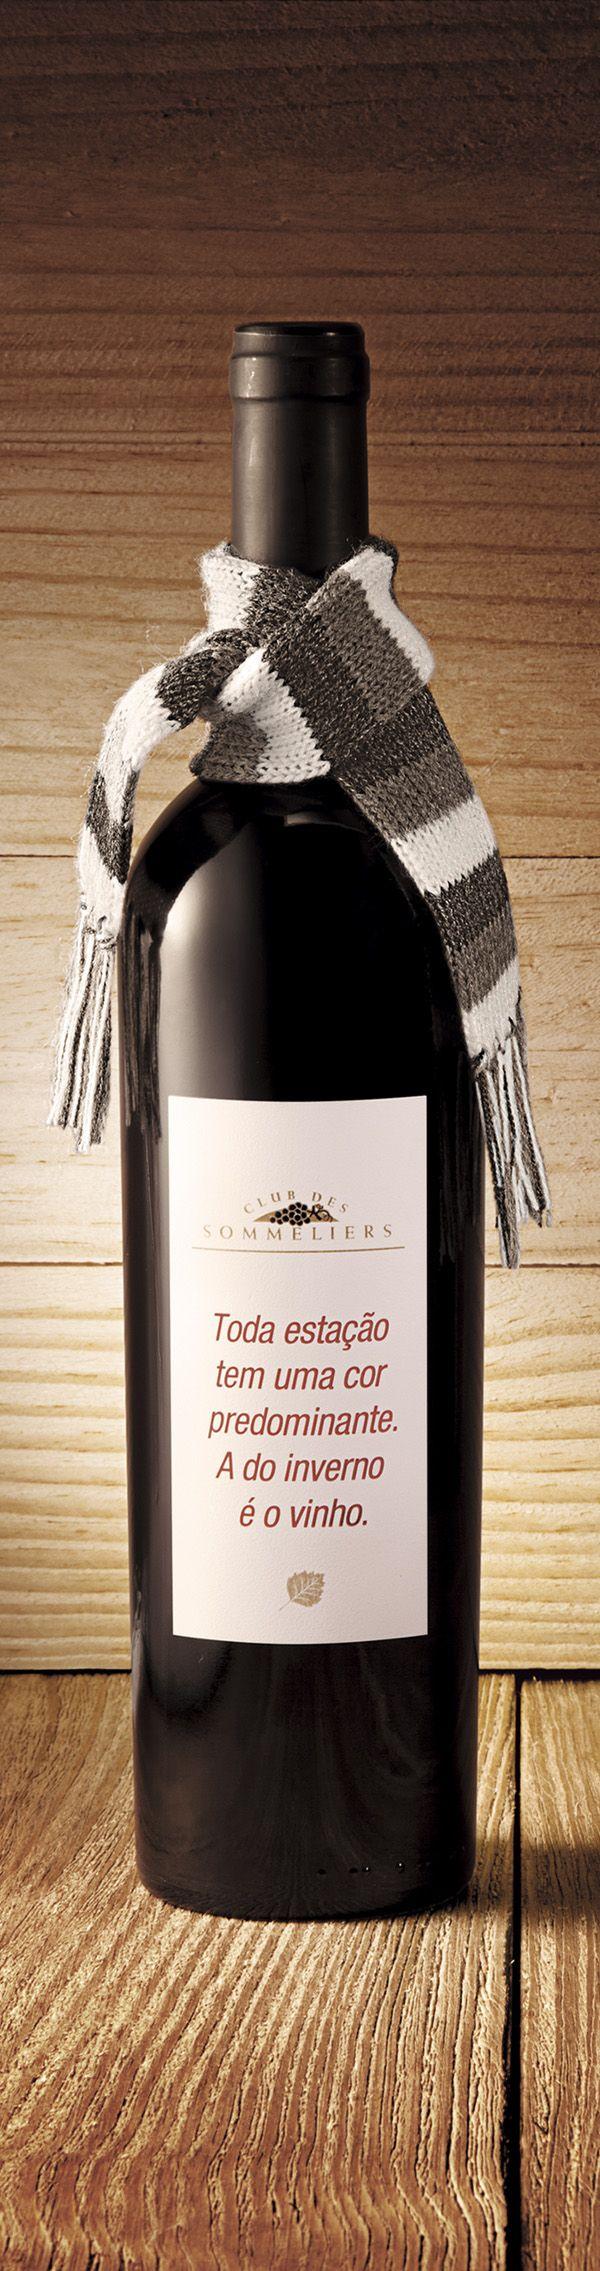 Inverno Club Des Sommeliers - Vinho